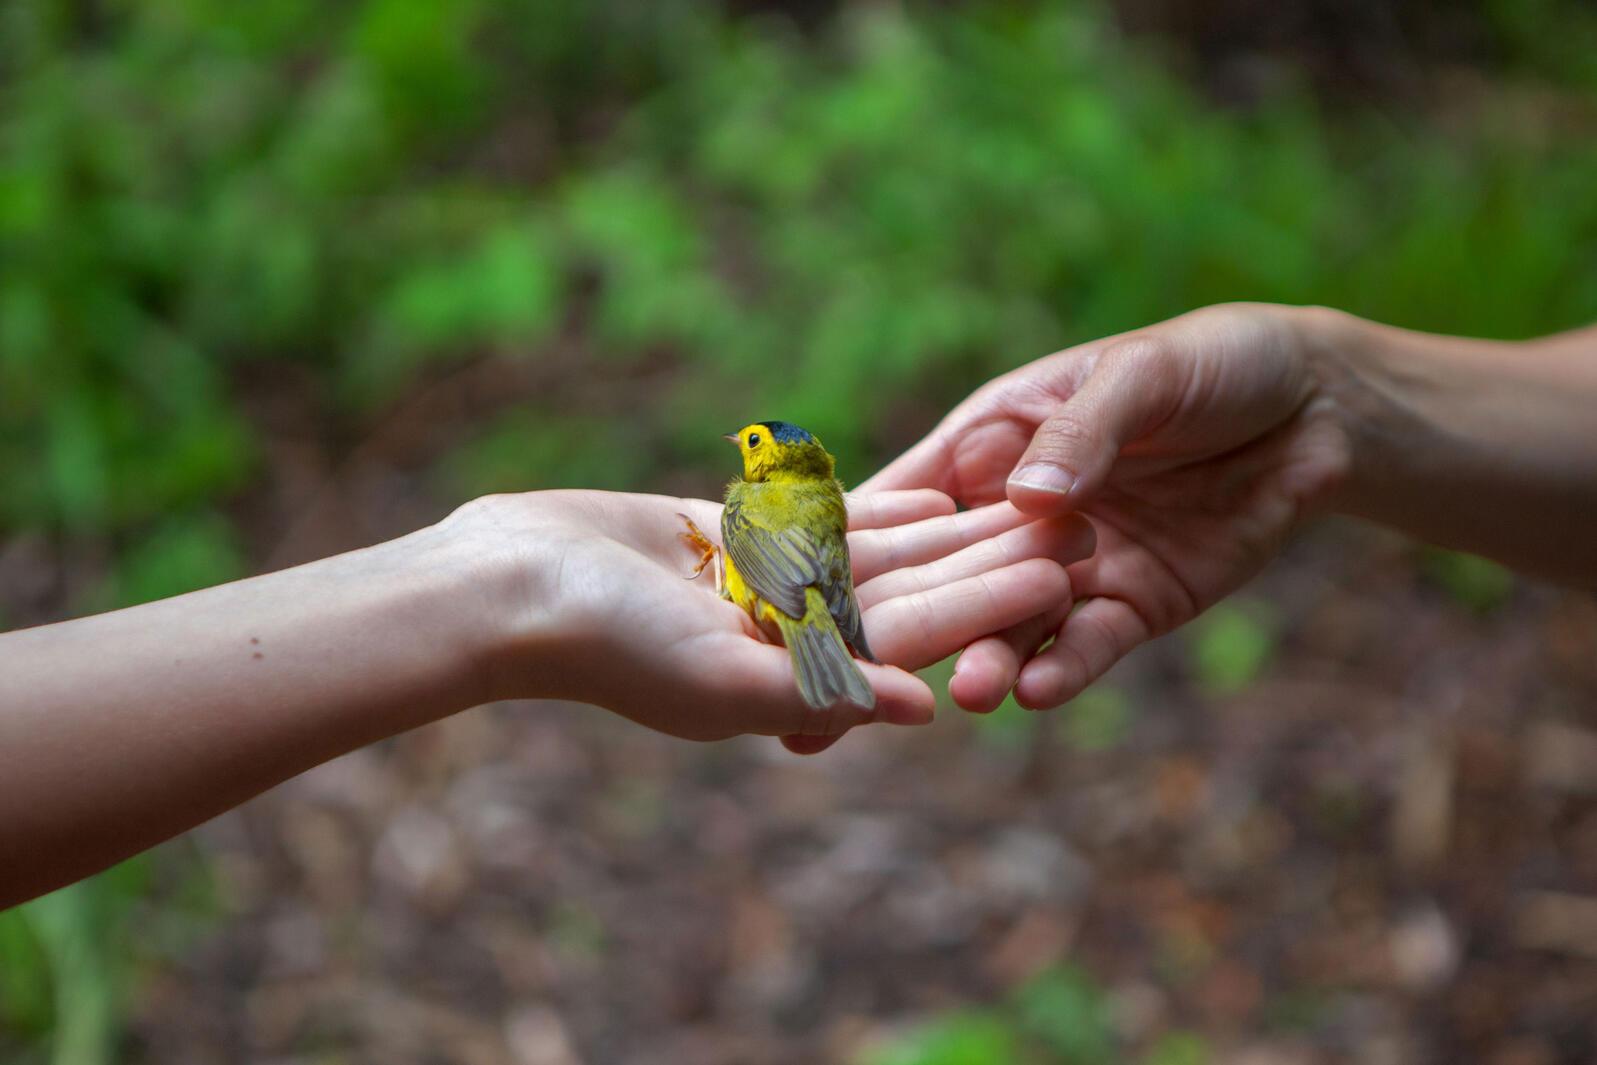 Wilson's Warbler. Camilla Cerea/Audubon